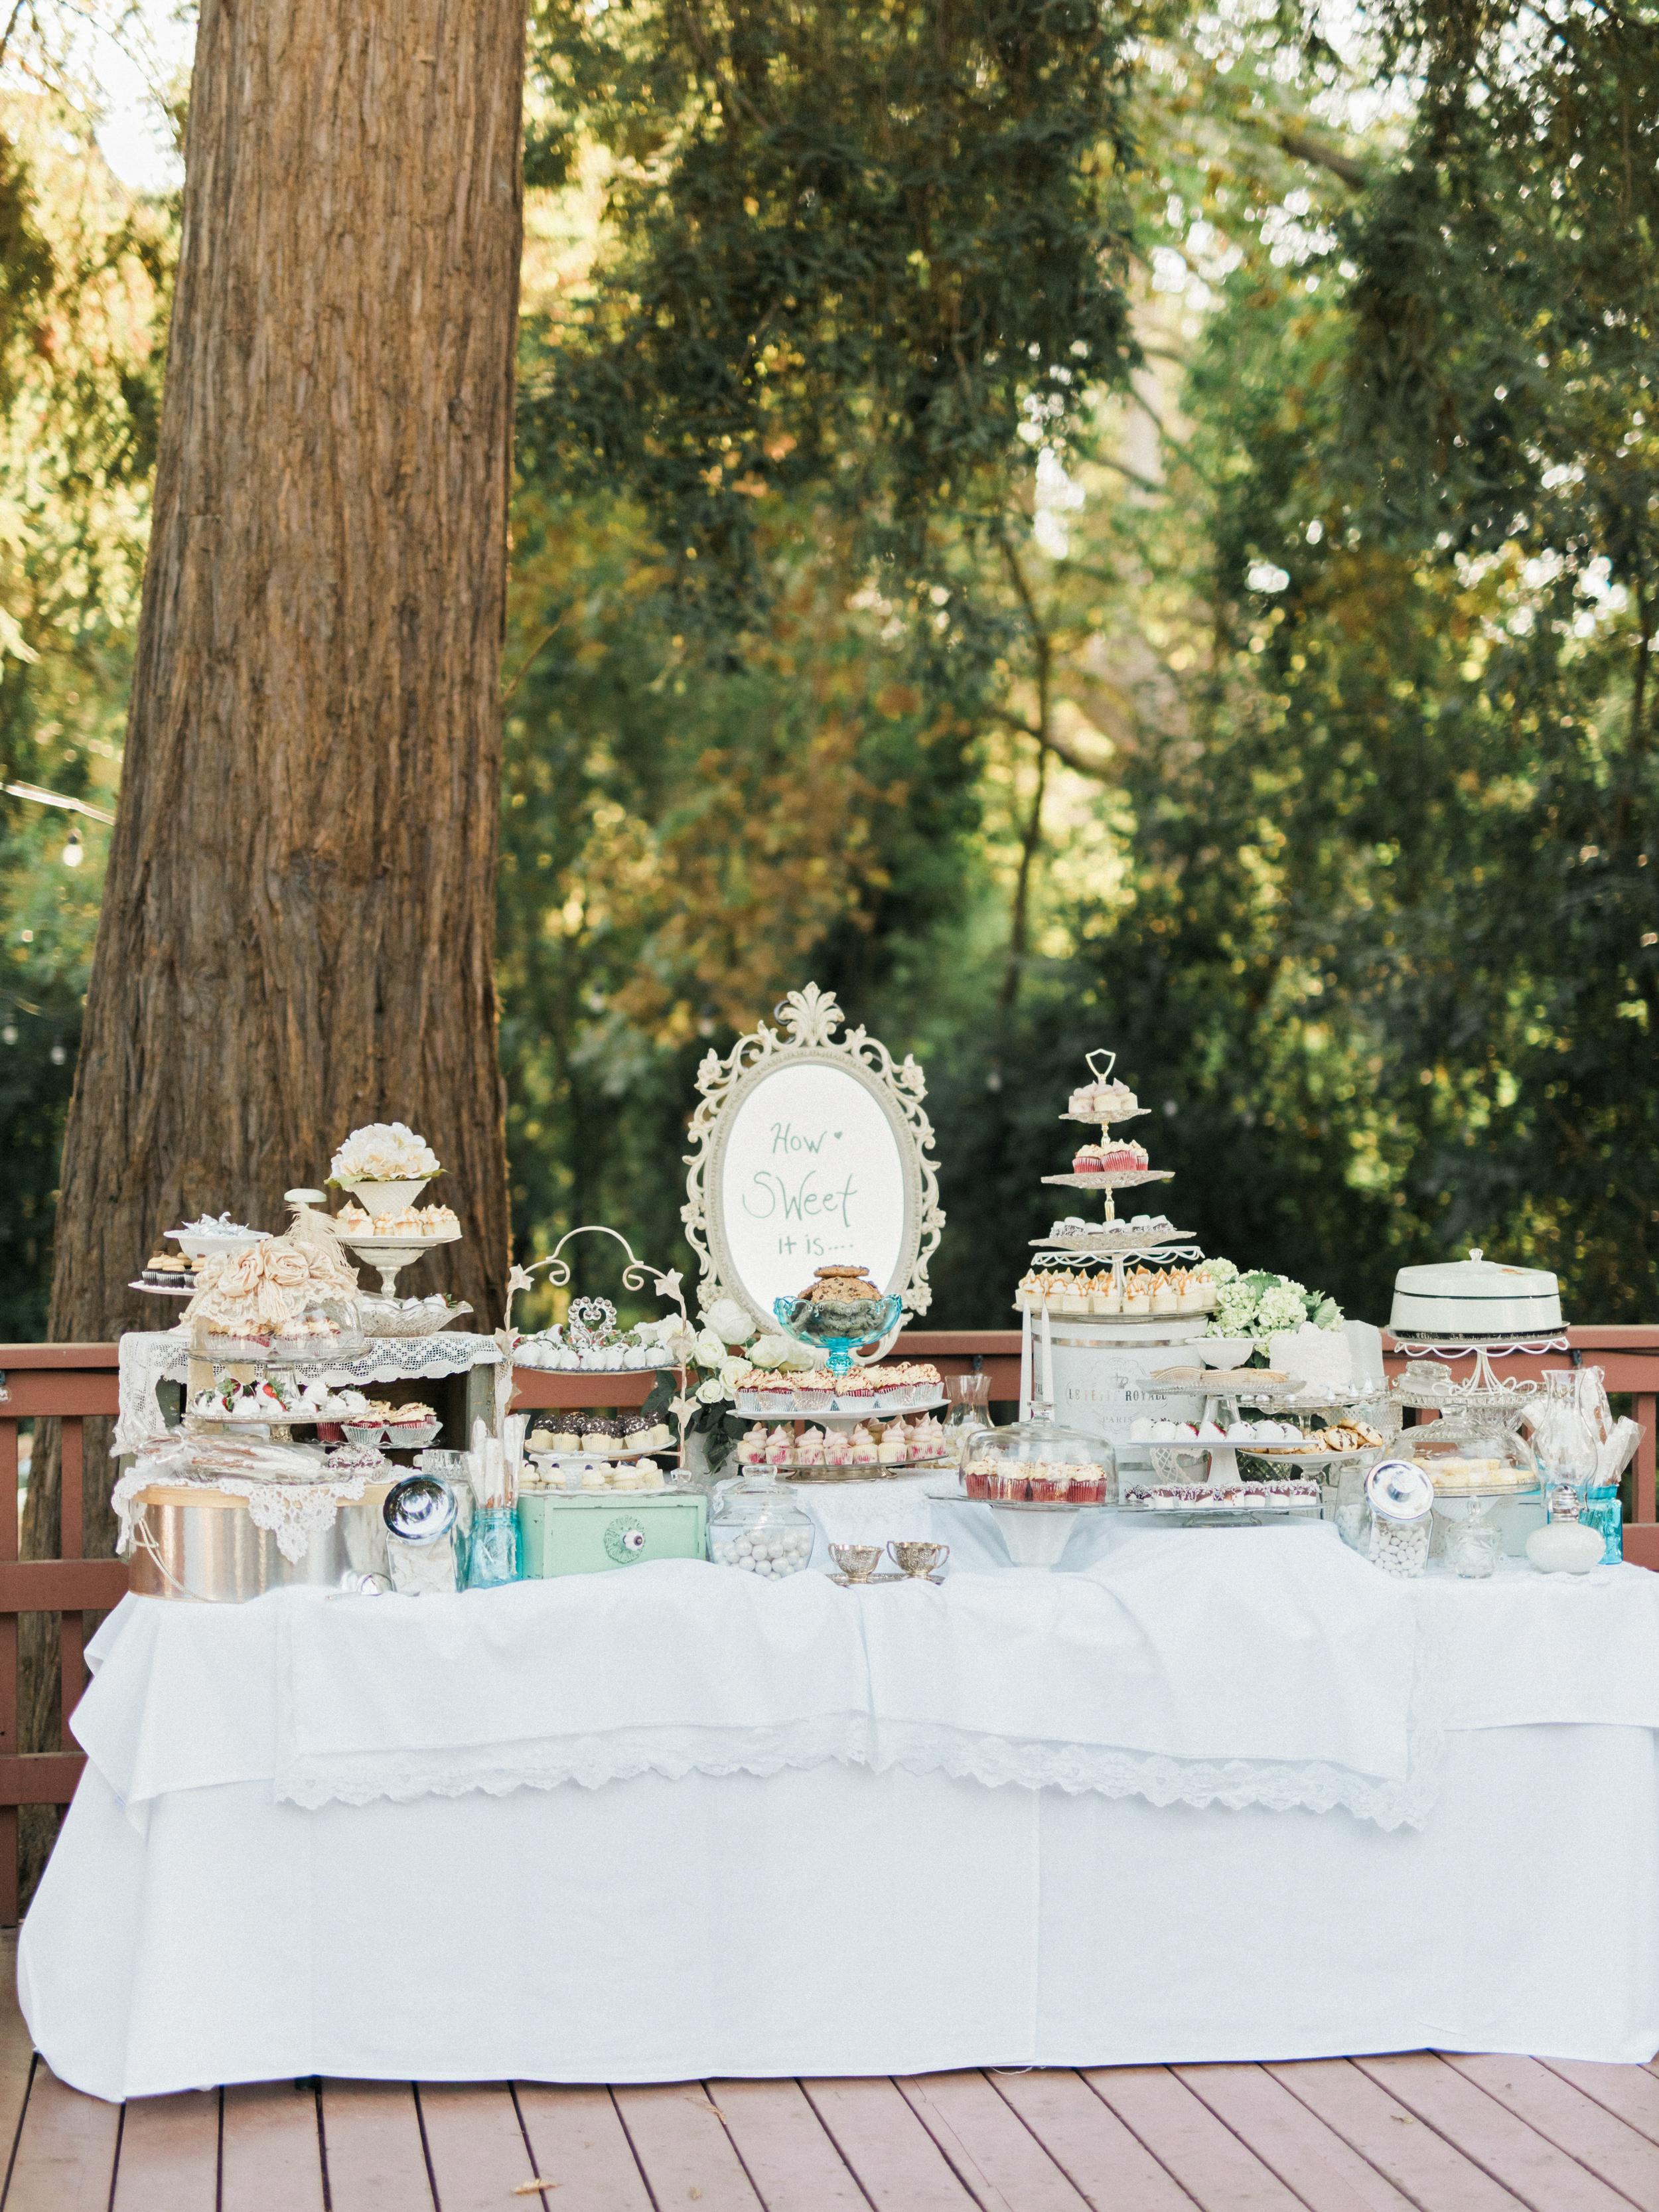 How To Create The Ultimate Wedding Dessert Table Martha Stewart